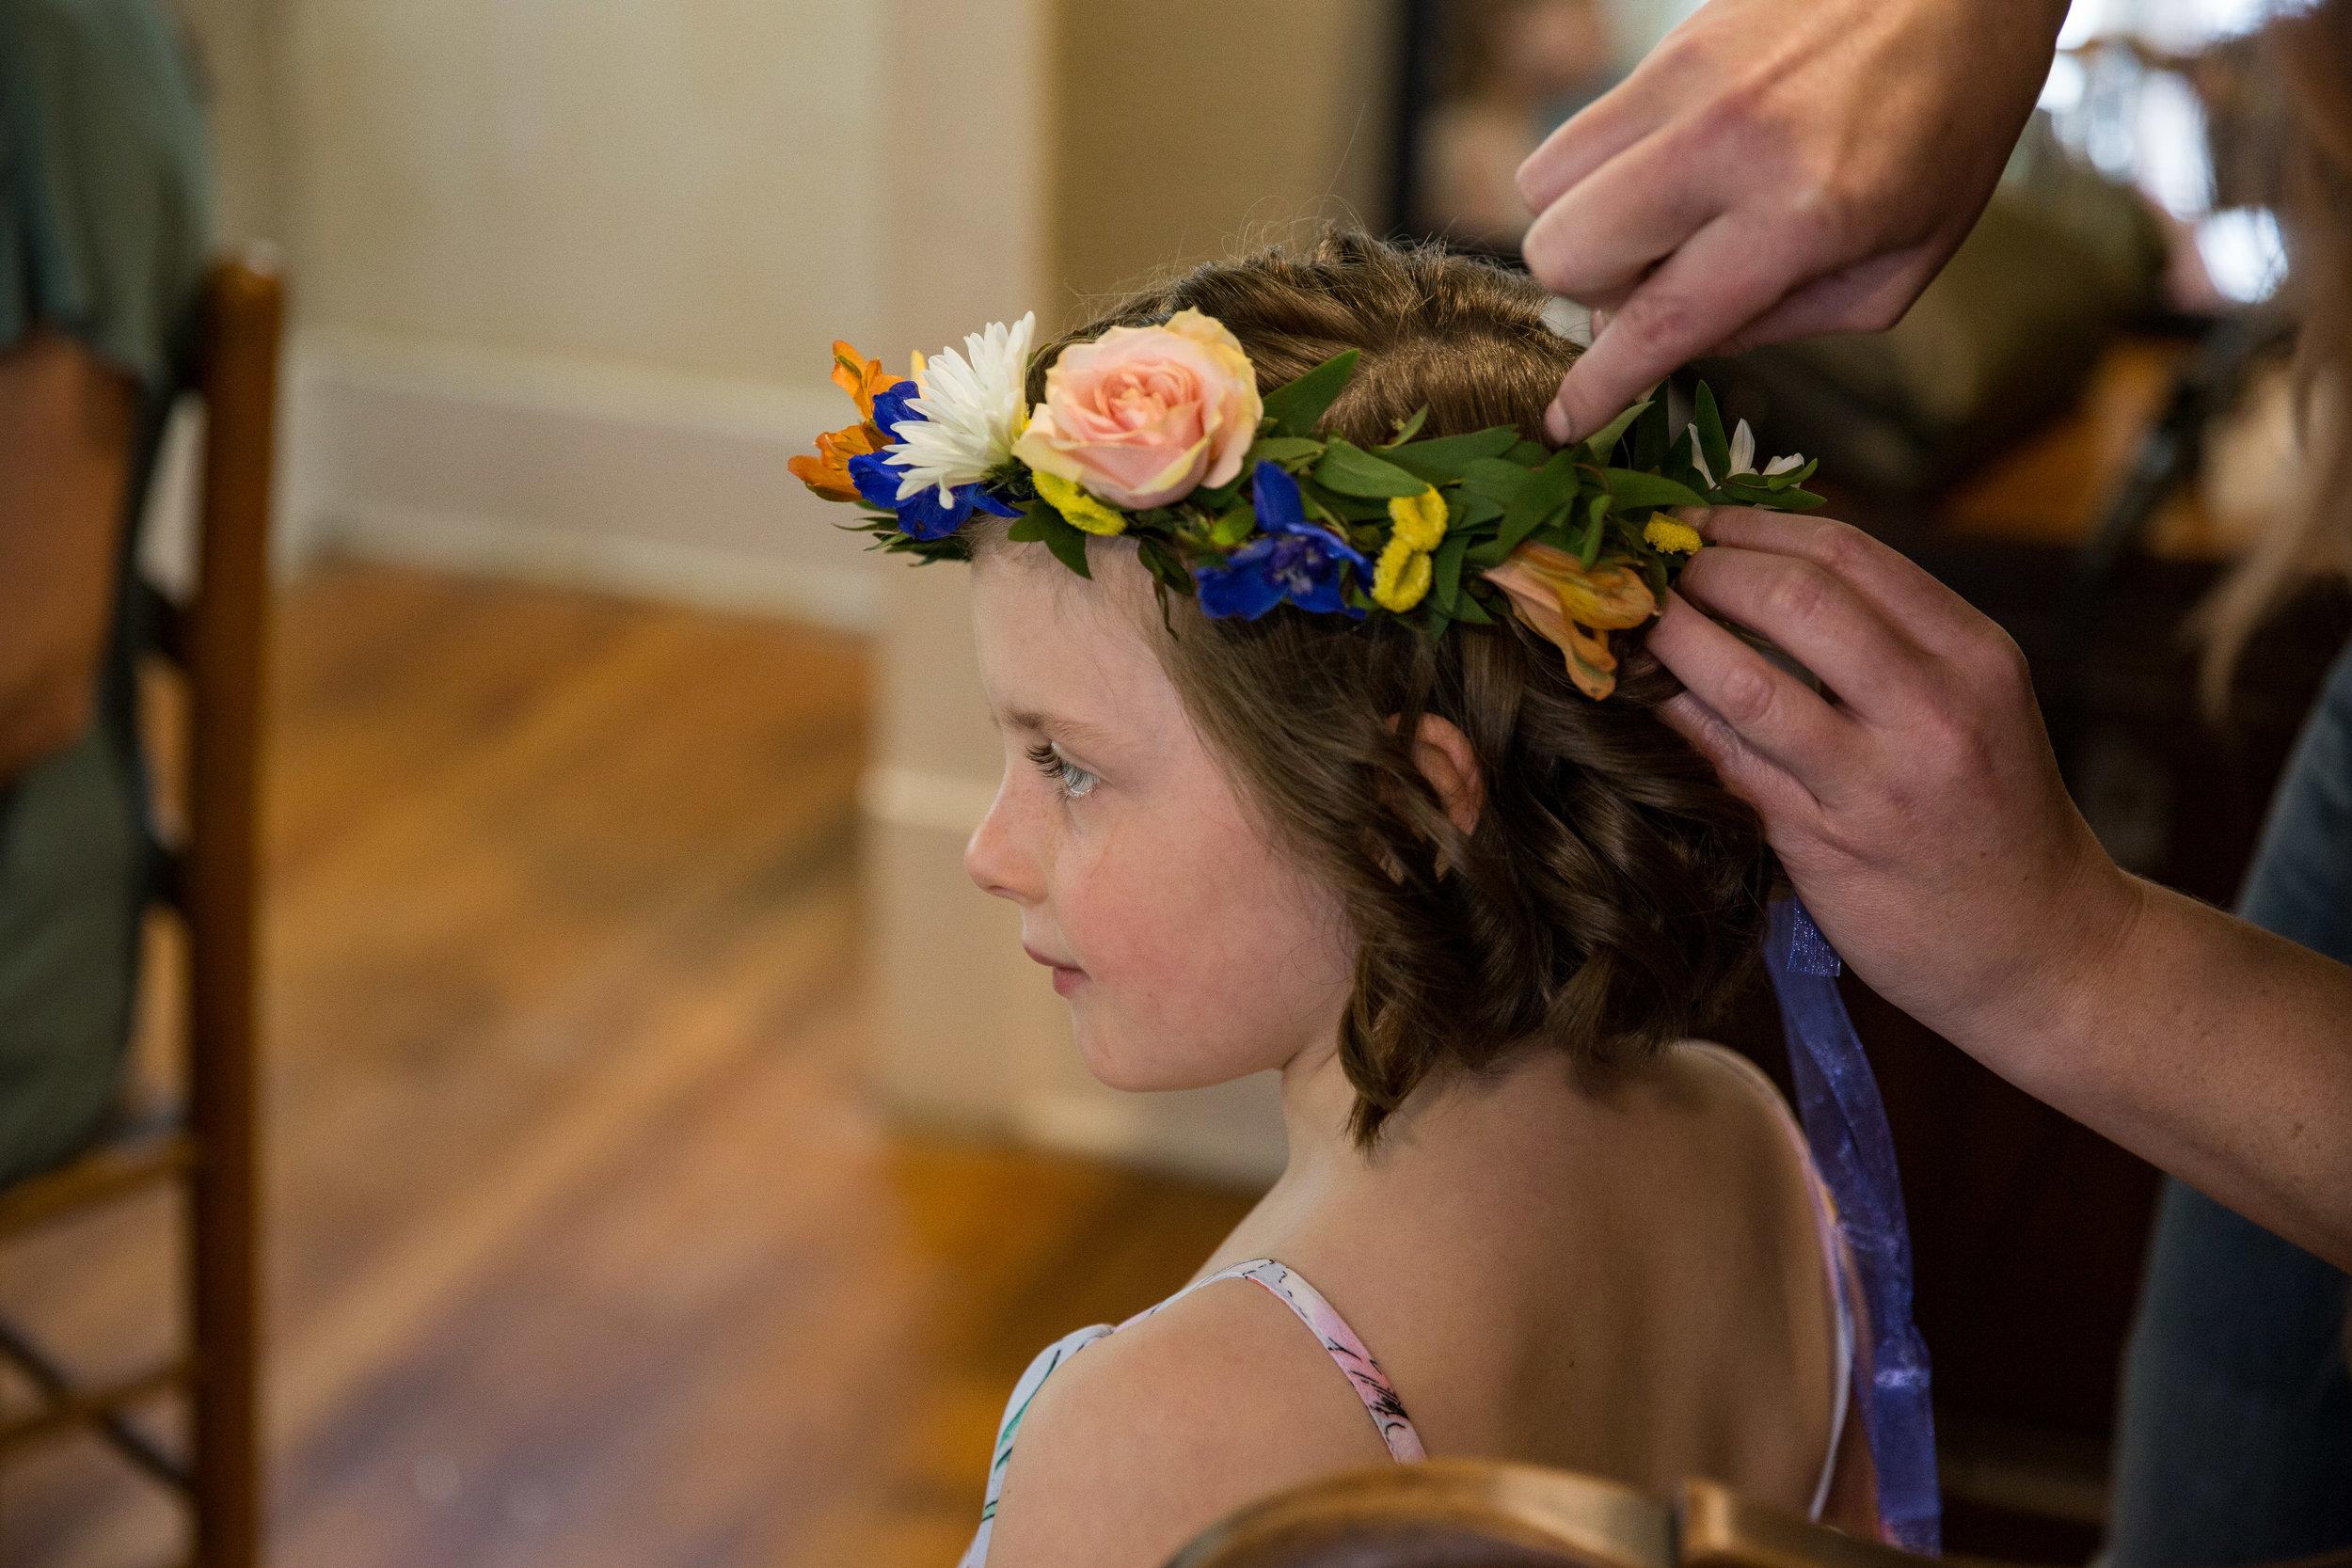 Natalie and Dallas Mooney Wedding 6-8-19_Tania Watt Photography-6.jpg